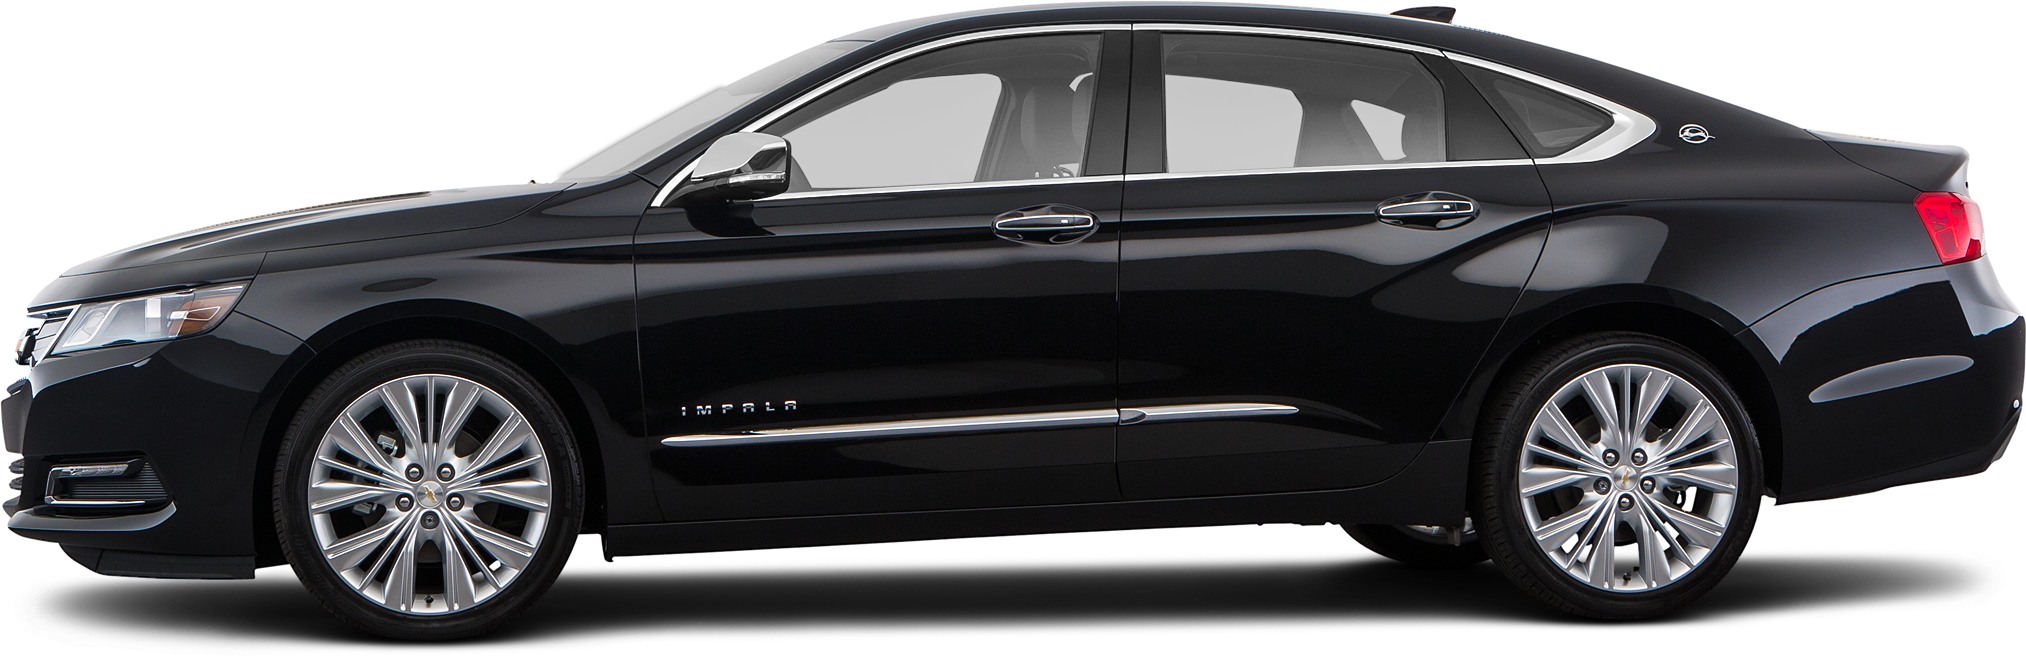 2019 Chevrolet Impala Sedan Premier w/2LZ